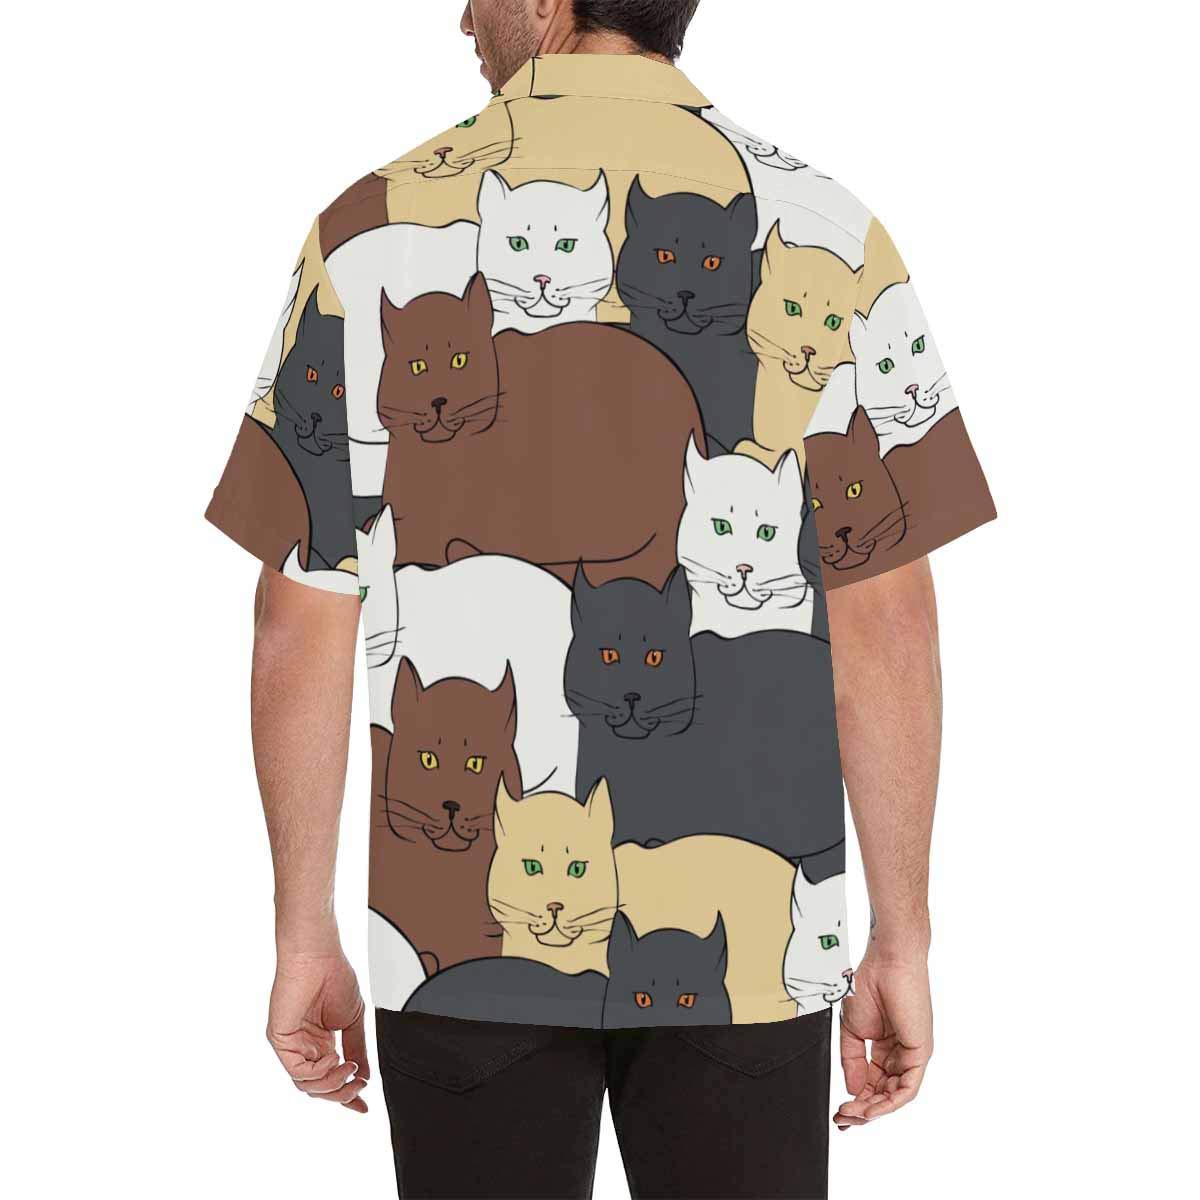 InterestPrint Mens Shirt British Cats Summer Casual Mens Shirt